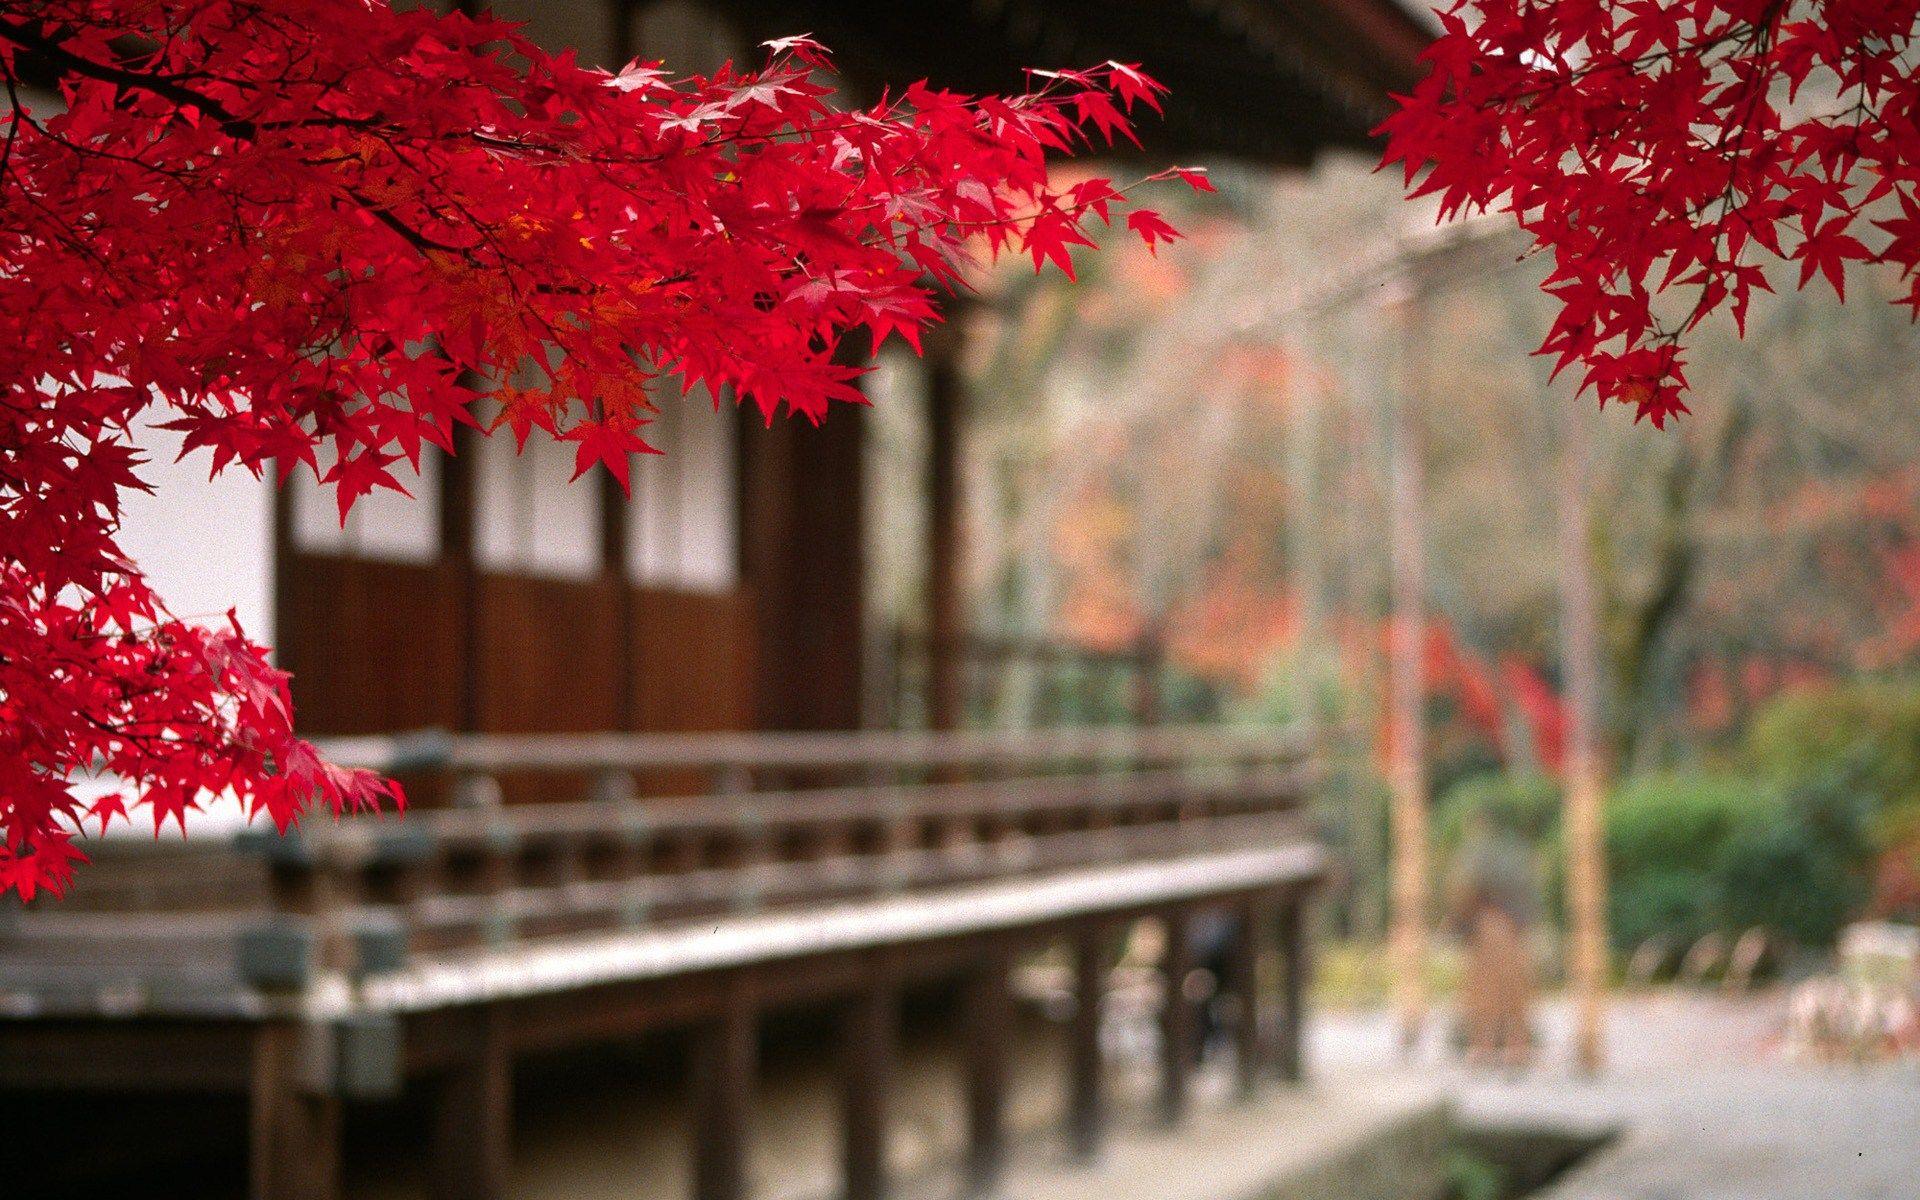 Hd wallpaper japan - Find Out Japan Autumn Wallpaper On Http Hdpicorner Com Japan